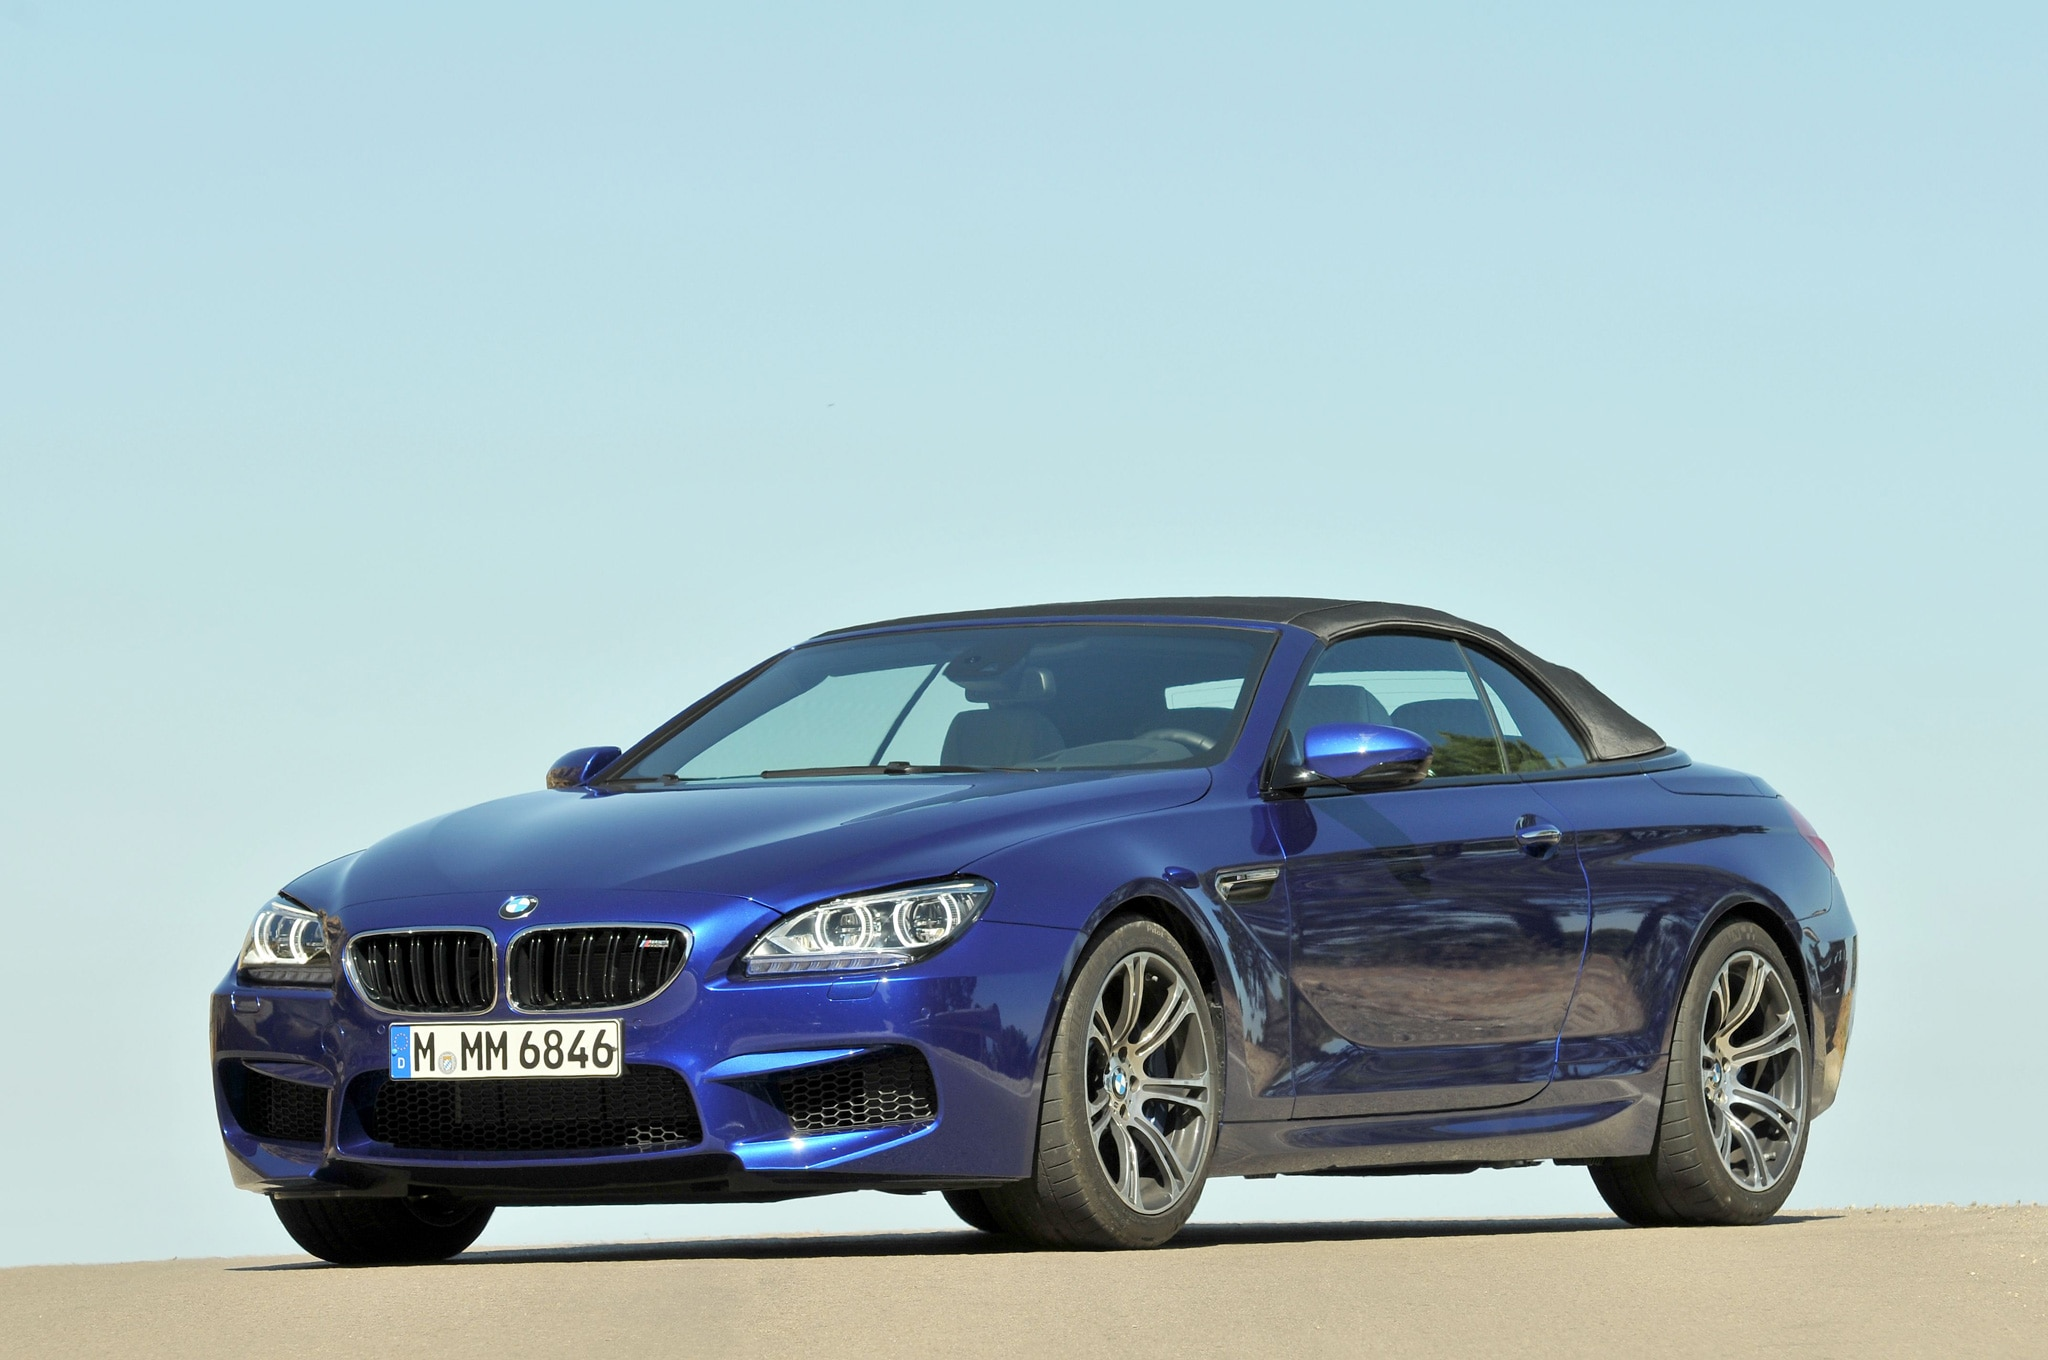 Bmw M6 0 60 >> 2014 BMW M6 Adds Manual-Transmission Option